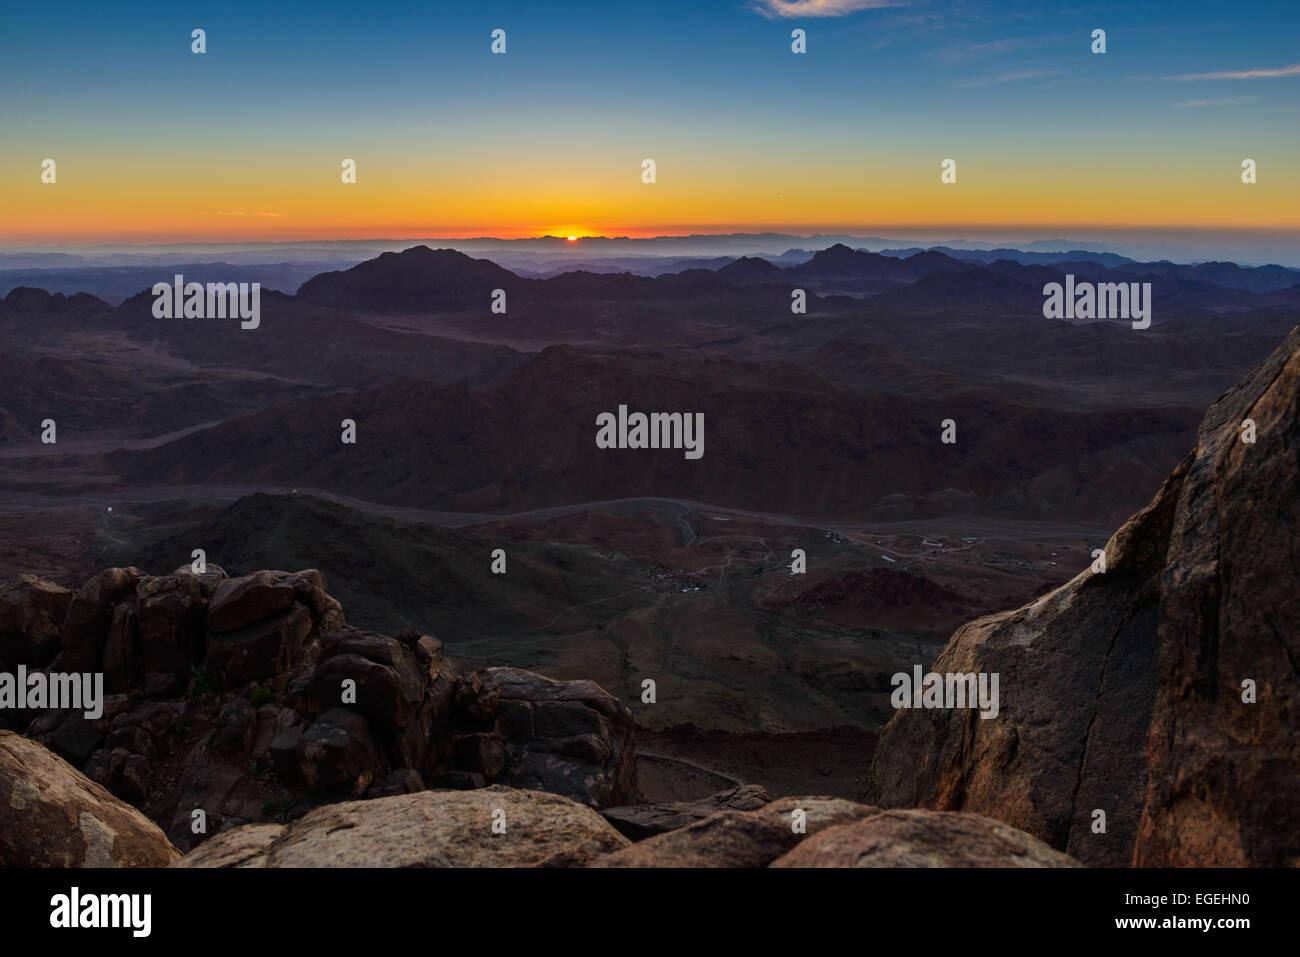 Sunrise at Mount Sinai, Egypt. Bedouins bring tourists in the night to Mount Sinai, Egypt to meet sunrise. - Stock Image